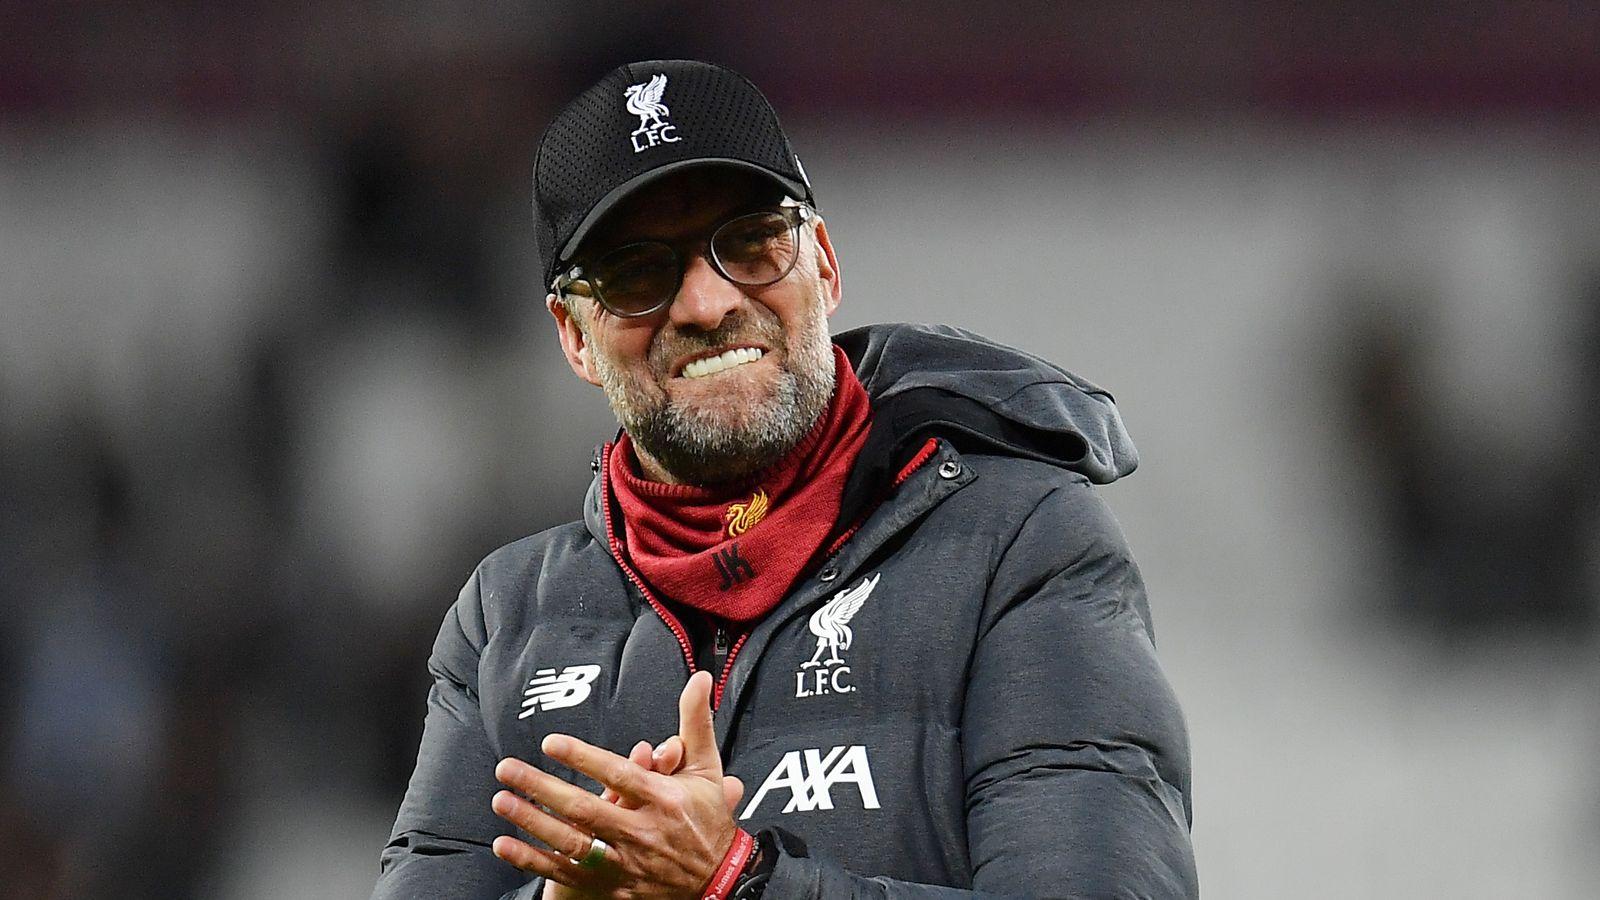 Jurgen Klopp praises achievements of his Liverpool side ...